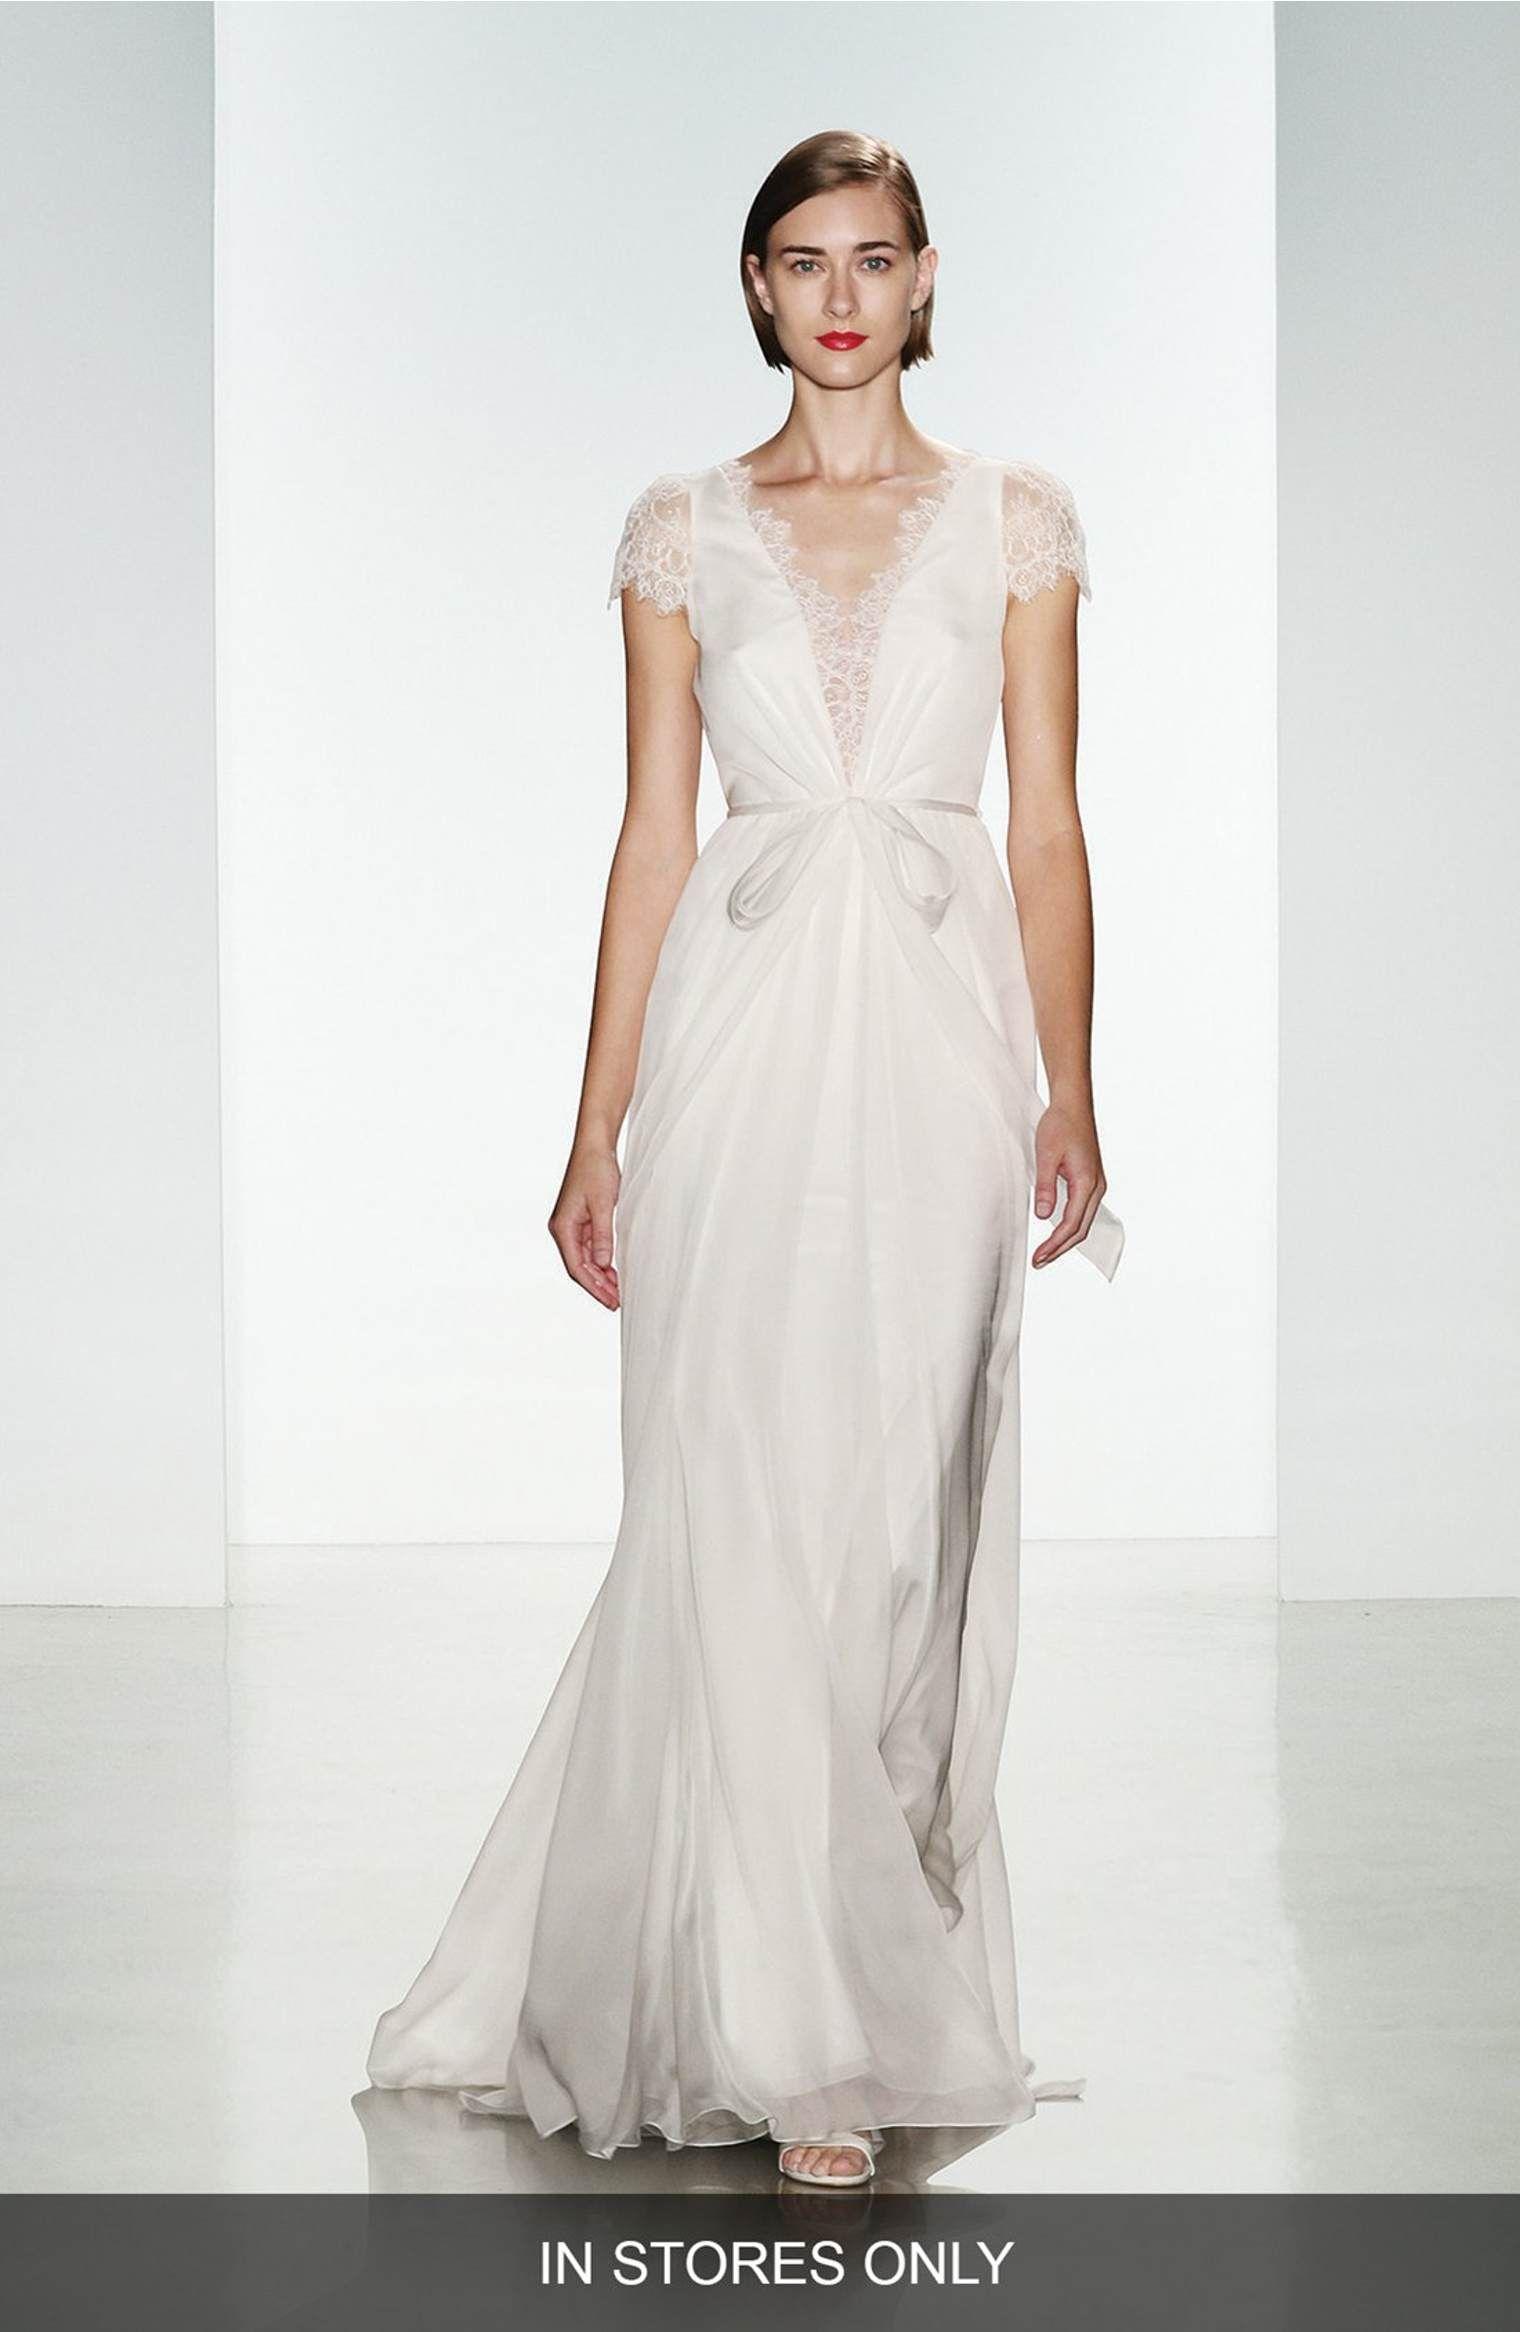 e6d8df4c2b6 Main Image - Christos Bridal  Lainee  Silk Chiffon   Lace Cap Sleeve Gown (